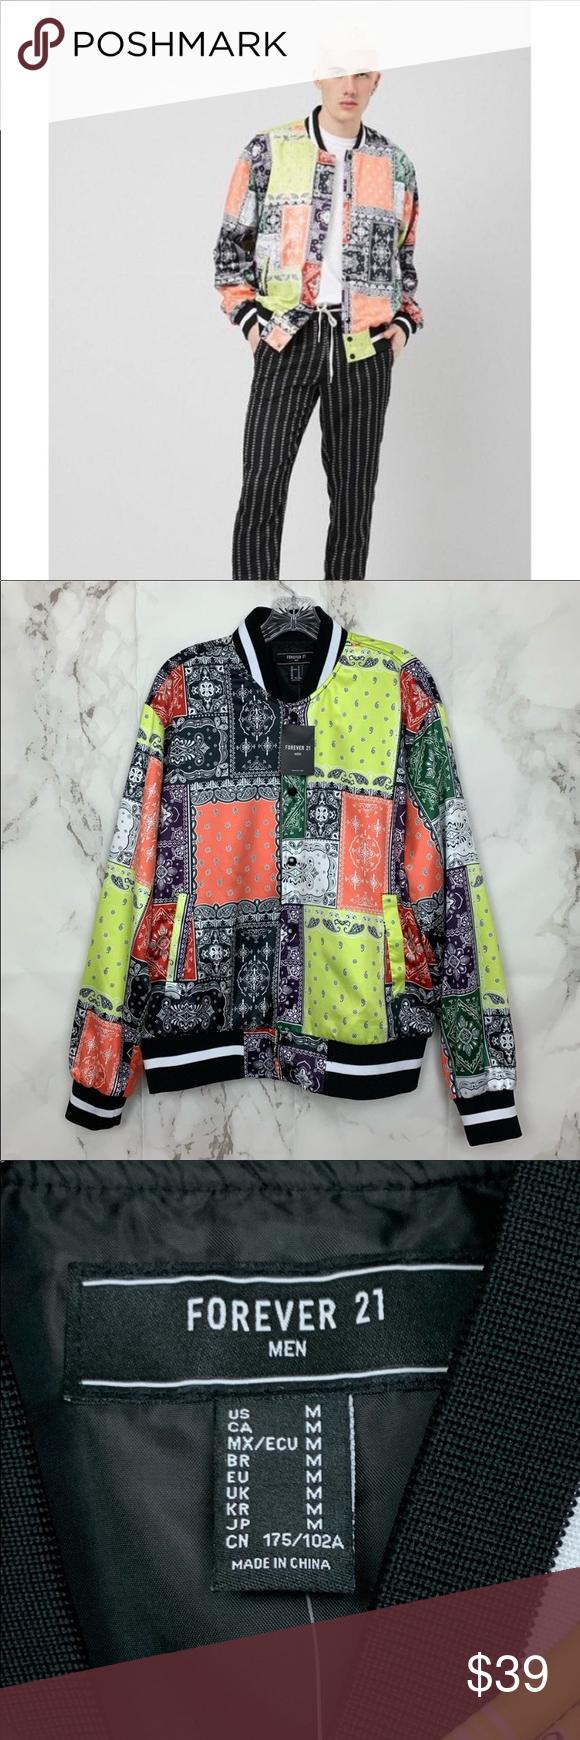 Nwt Forever 21 Men Satin Bandana Bomber Jacket Bomber Jacket Forever 21 Men Clothes Design [ 1740 x 580 Pixel ]